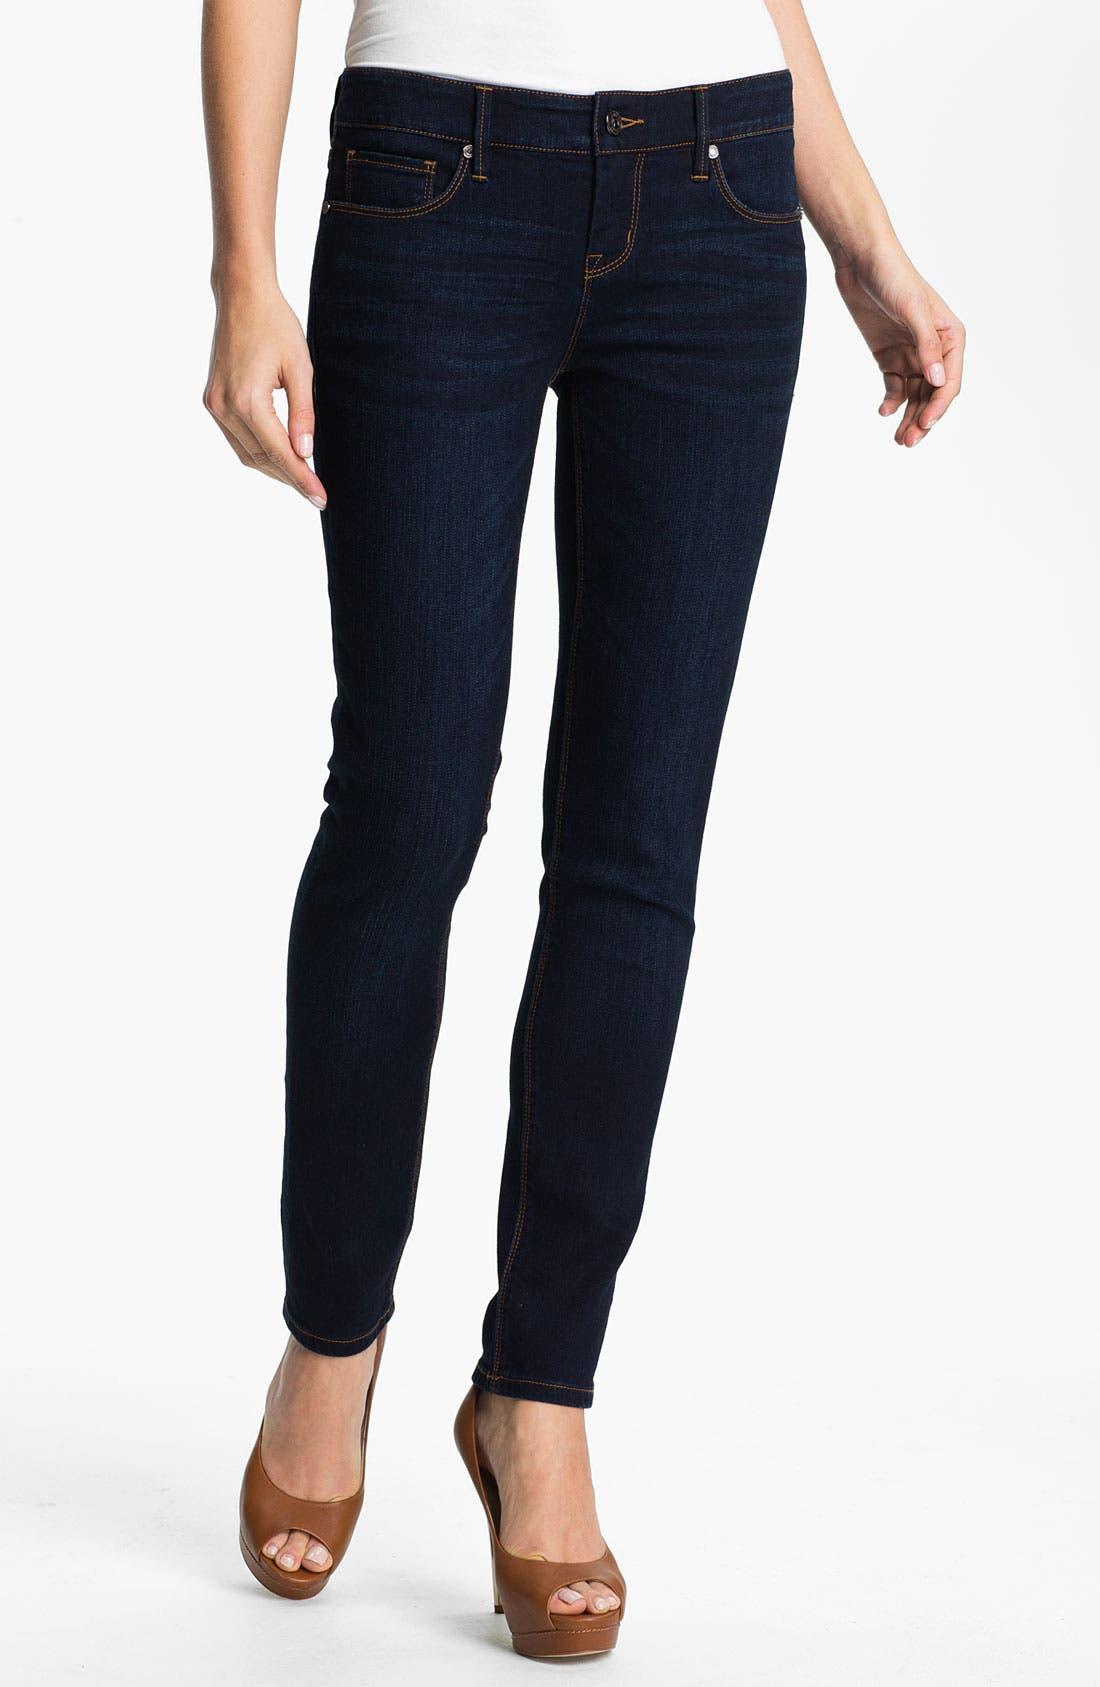 Alternate Image 1 Selected - Isaac Mizrahi Jeans 'Samantha' Skinny Jeans (Madison)